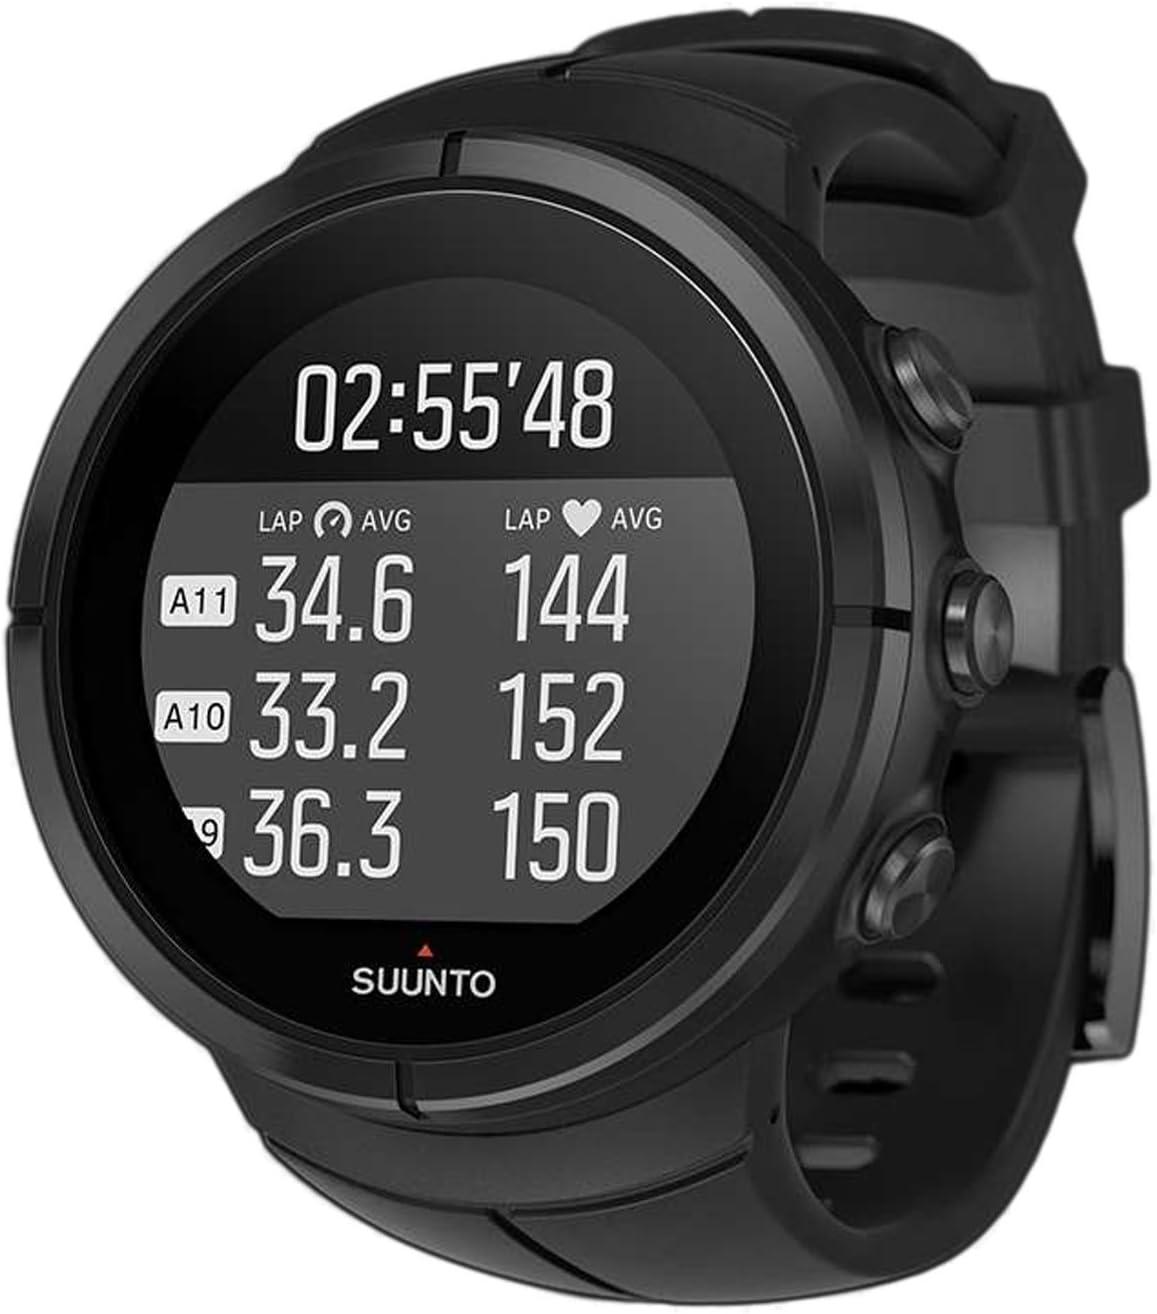 Suunto - Spartan Ultra All Black Titanium HR - SS022654000 - Reloj Multideporte GPS + Cinturón de frecuencia cardiaca (Talla M) - Talla única